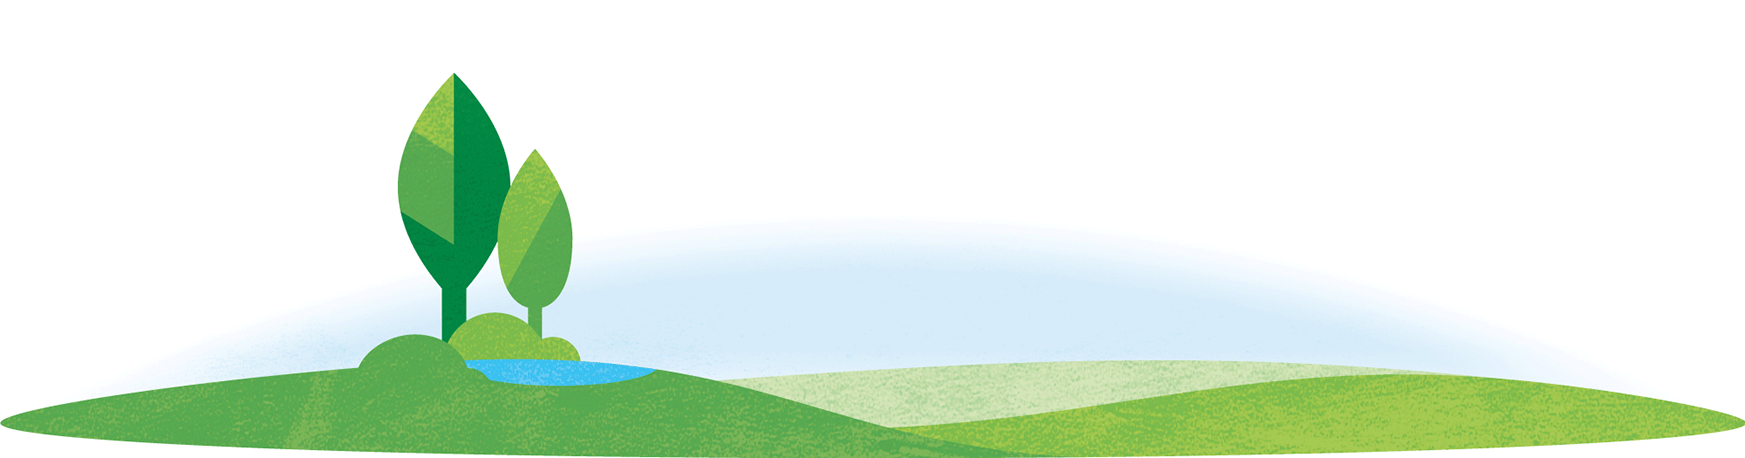 Effective water treatment | Nestlé Global